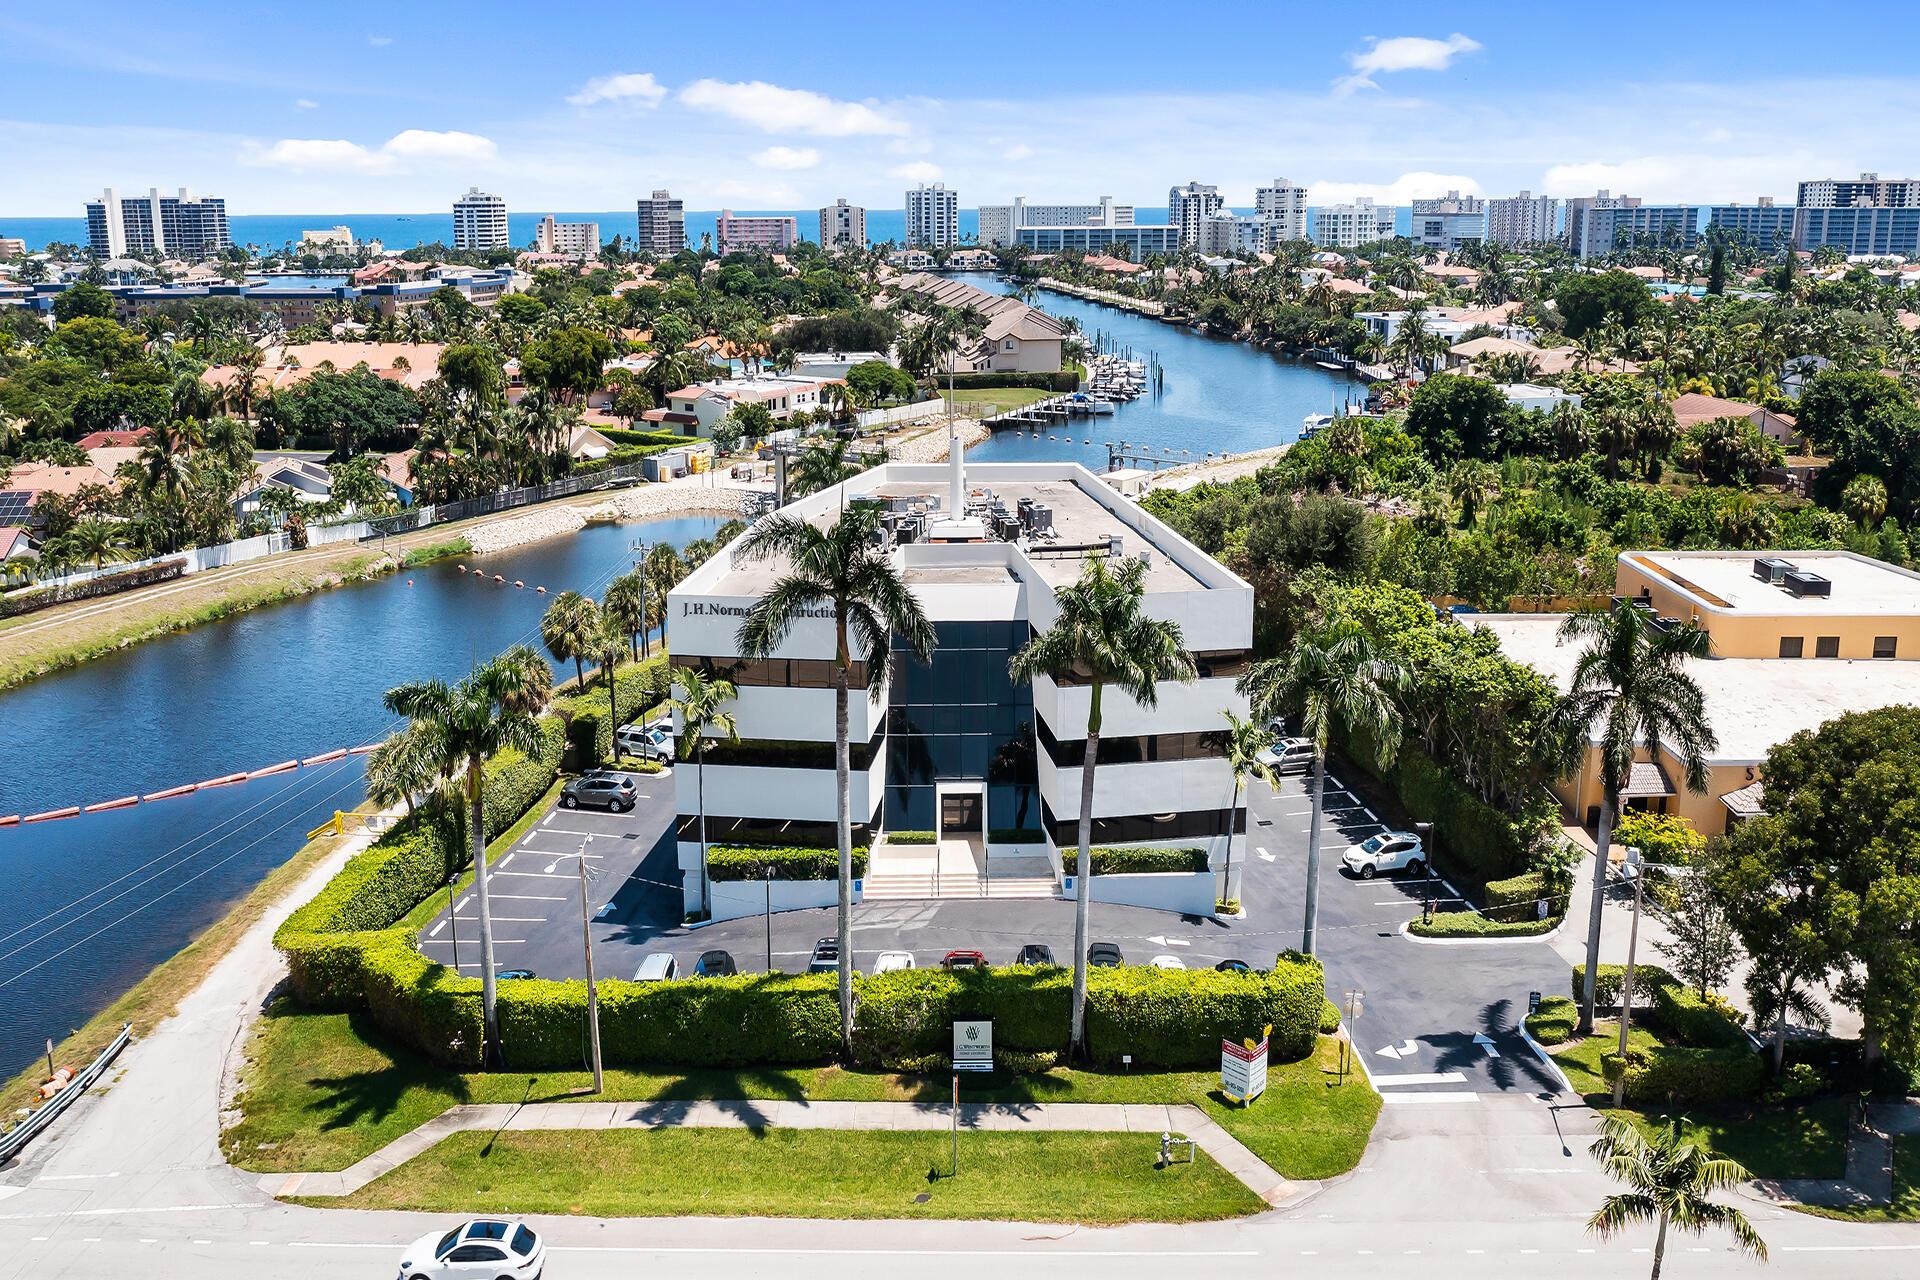 8000 Federal Unit , Boca Raton, Florida 33487